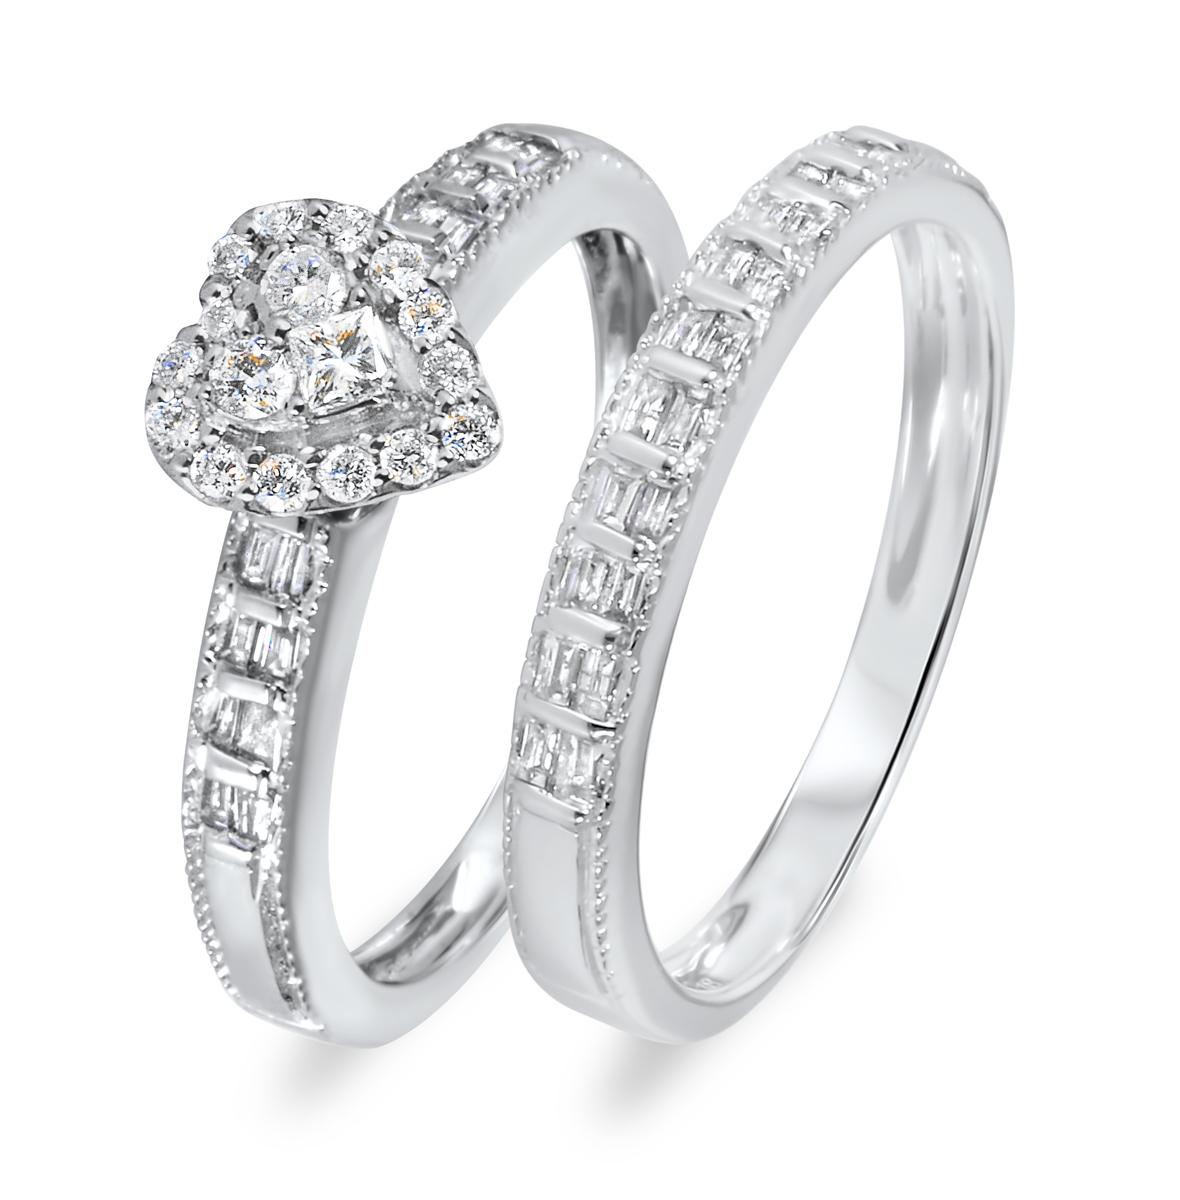 5/8 CT. T.W. Diamond Women's Bridal Wedding Ring Set 14K White Gold